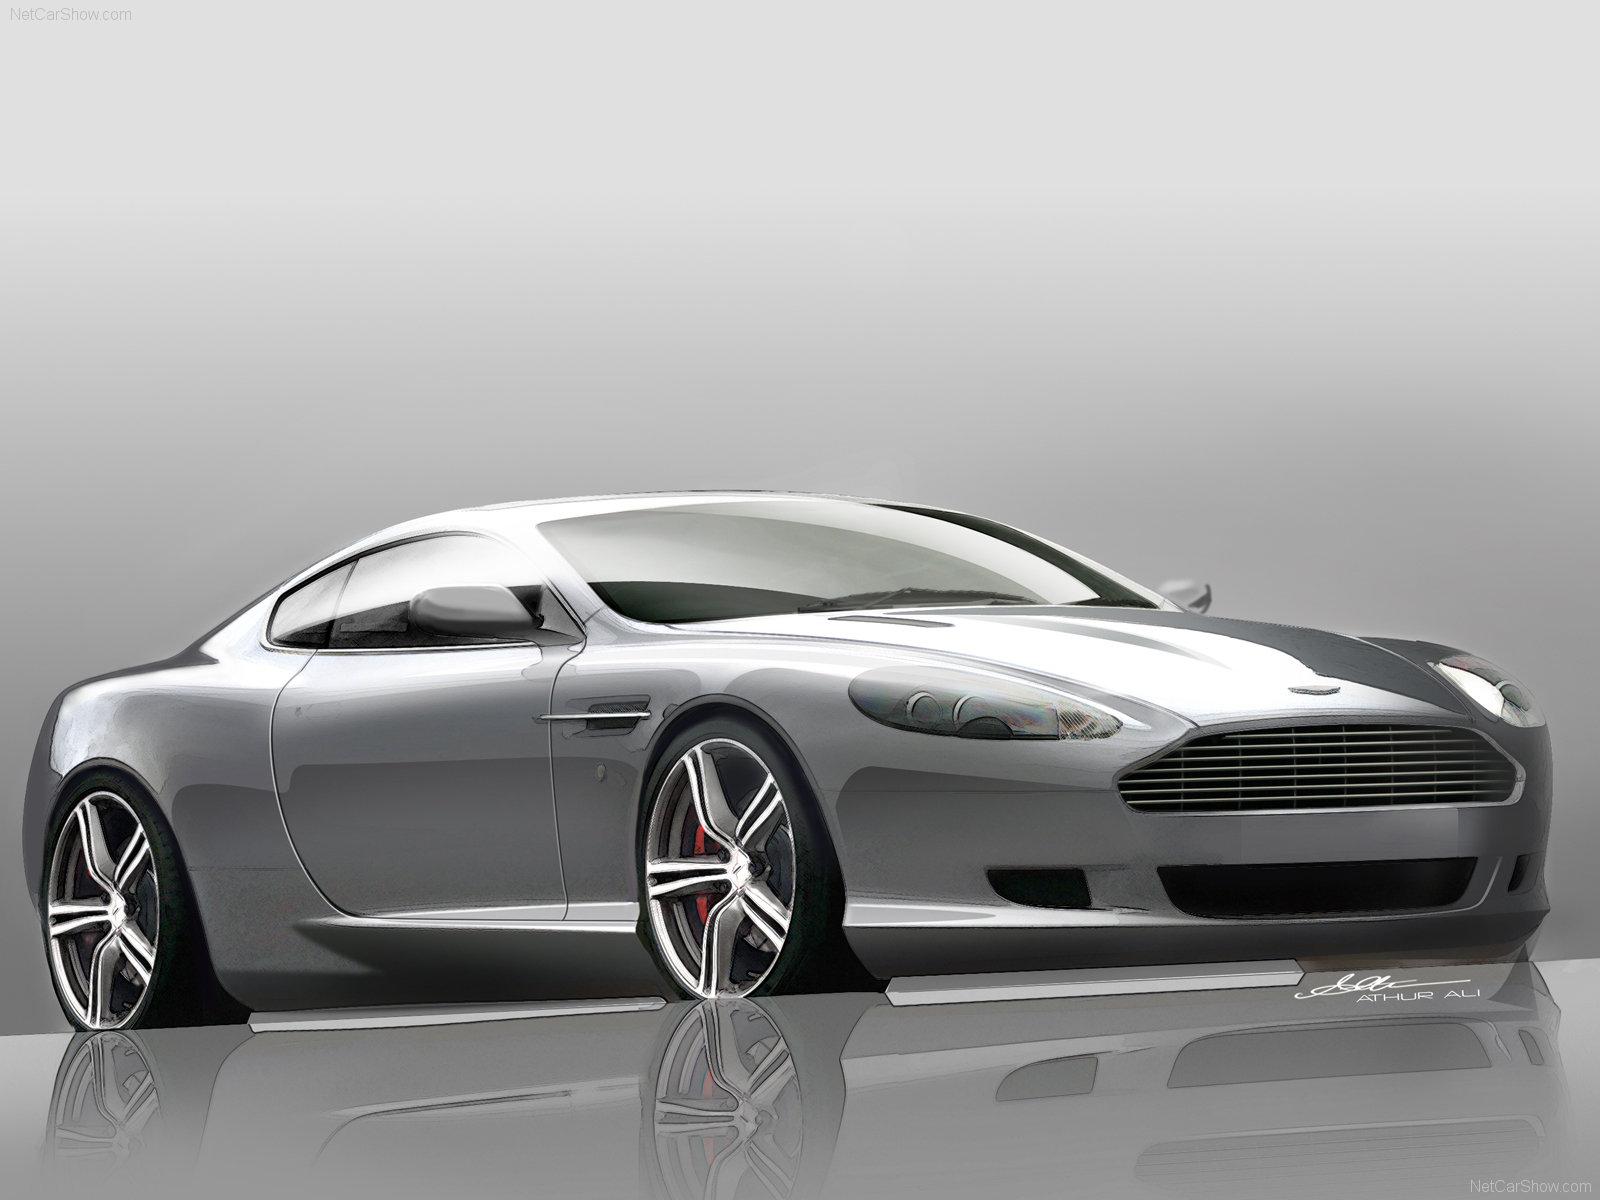 Фотографии Aston Martin DB9 LM — карточка поРьзоватеРя cherniawsky